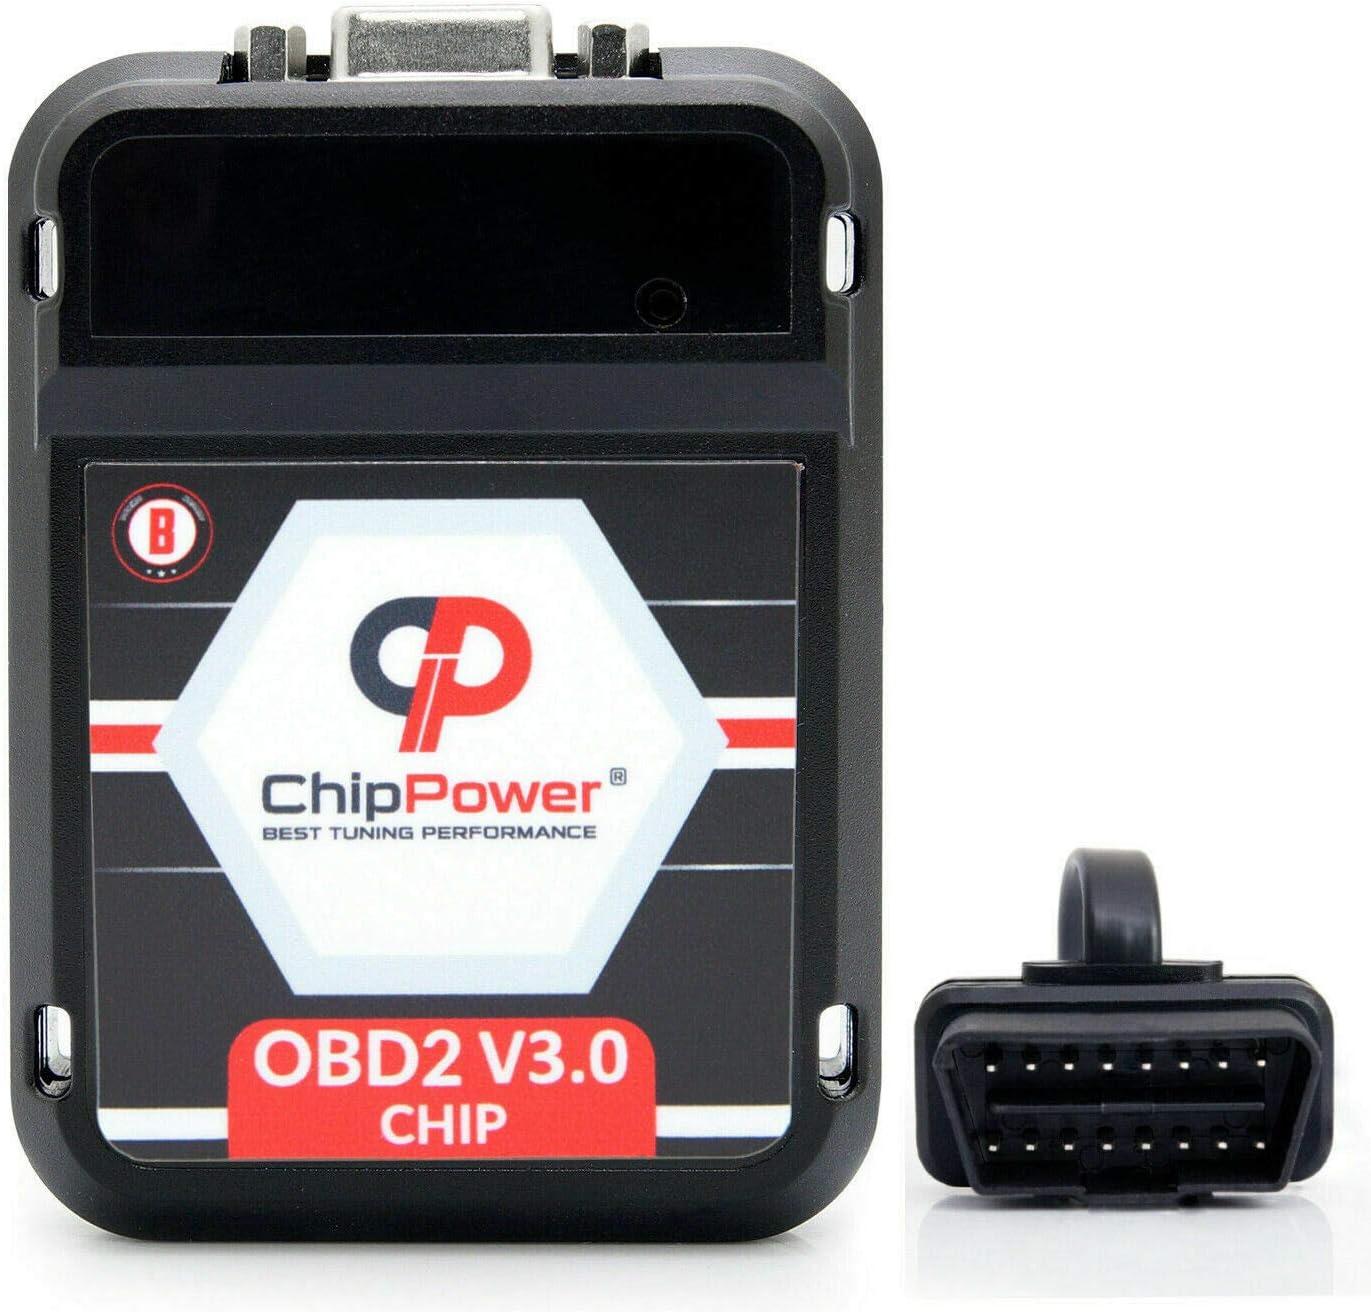 8P Chiptuning ChipPower OBD2 v3 f/ür A3 2.0 FSI 150 PS 2003-2008 Tuning Benzin